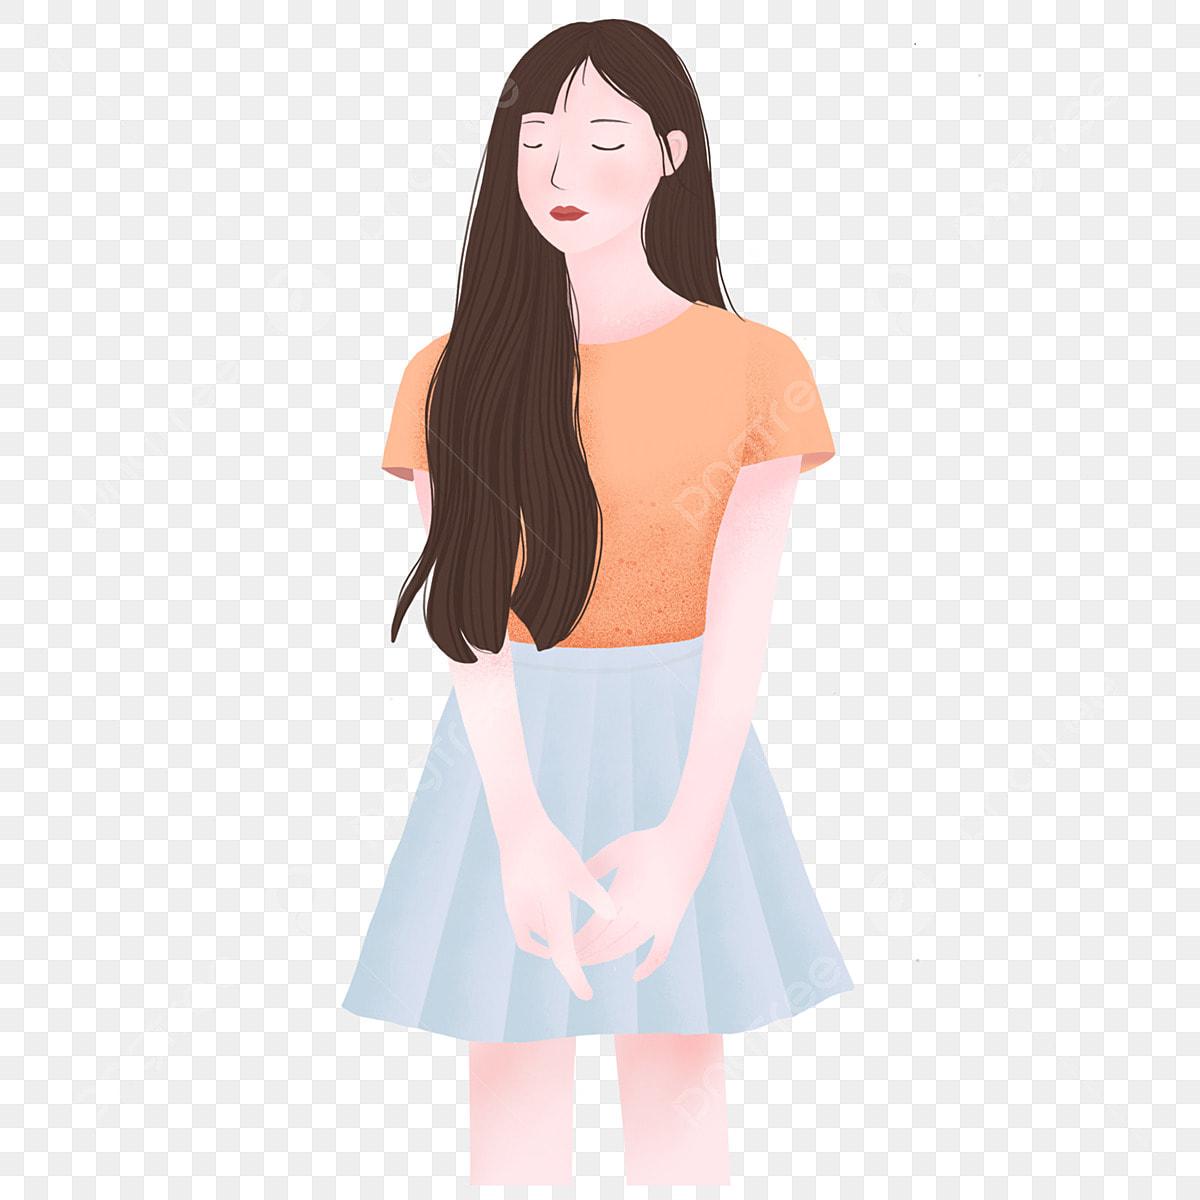 Gambar Kartun Wanita Png Gambar Keindahan Kartun Memakai Meditasi Rambut Panjang Gadis